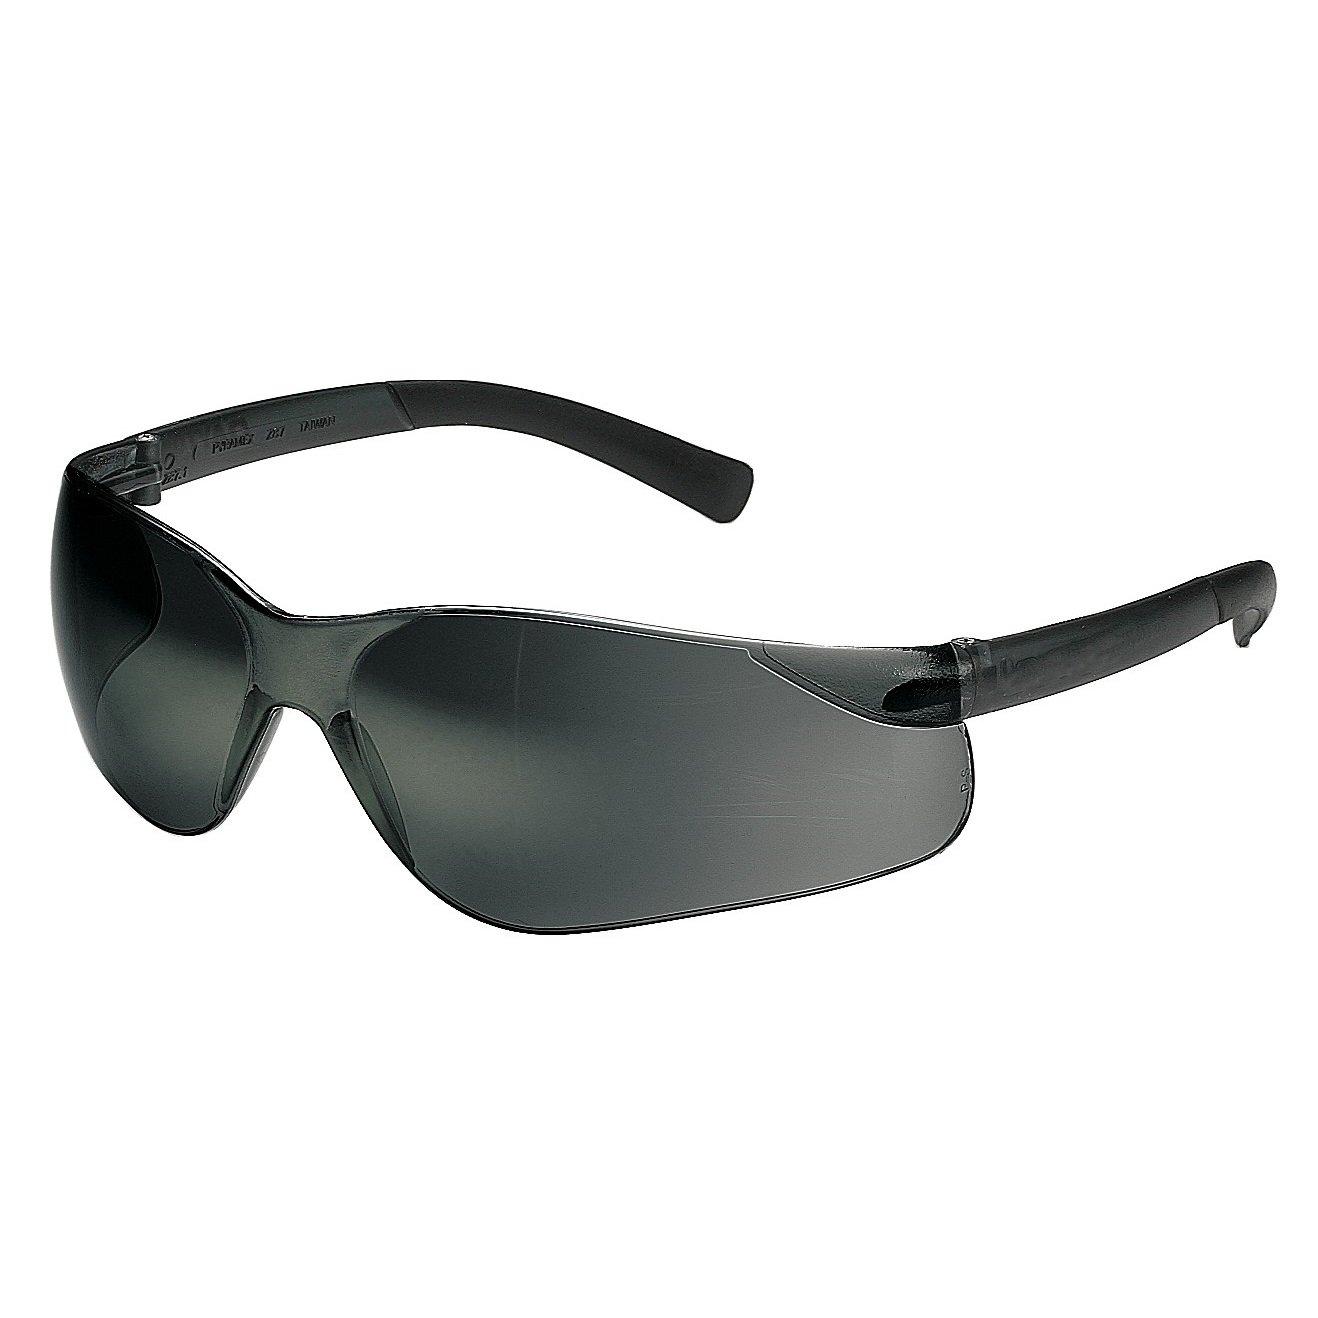 Clear Galeton 9200045 Sportster Lightweight Wraparound Anti-Fog Anti-Scratch Lens Safety Glasses